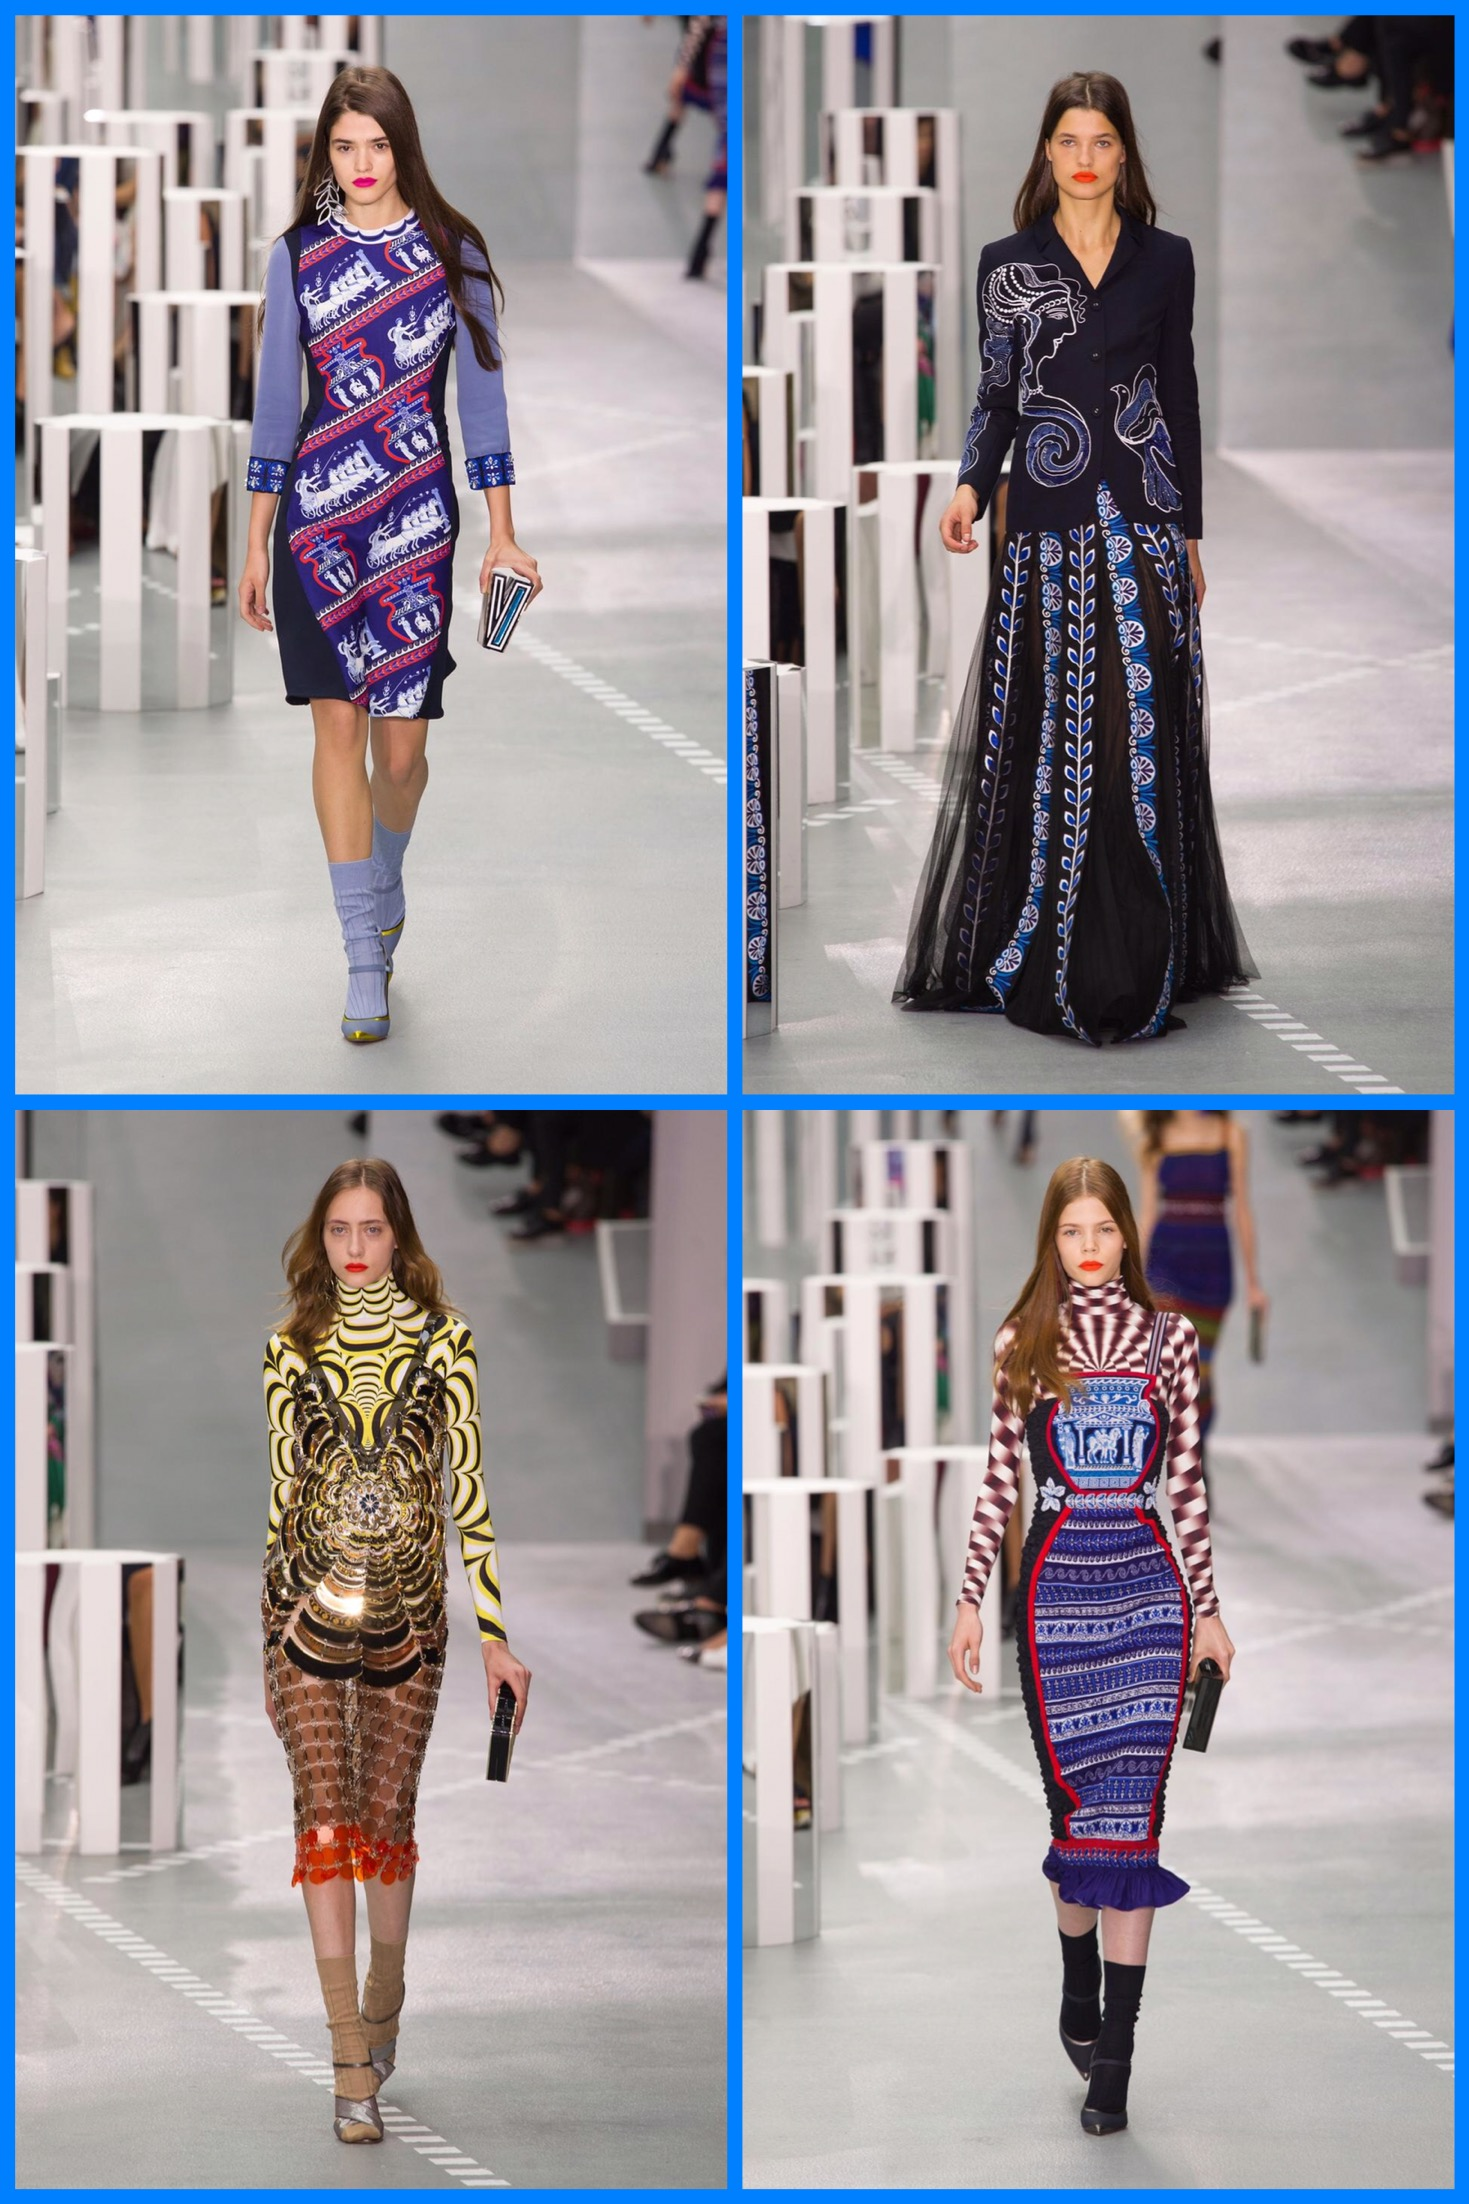 london-fashion-week-pret-a-porter-spring-summer-2017-style-mary-katrantzou